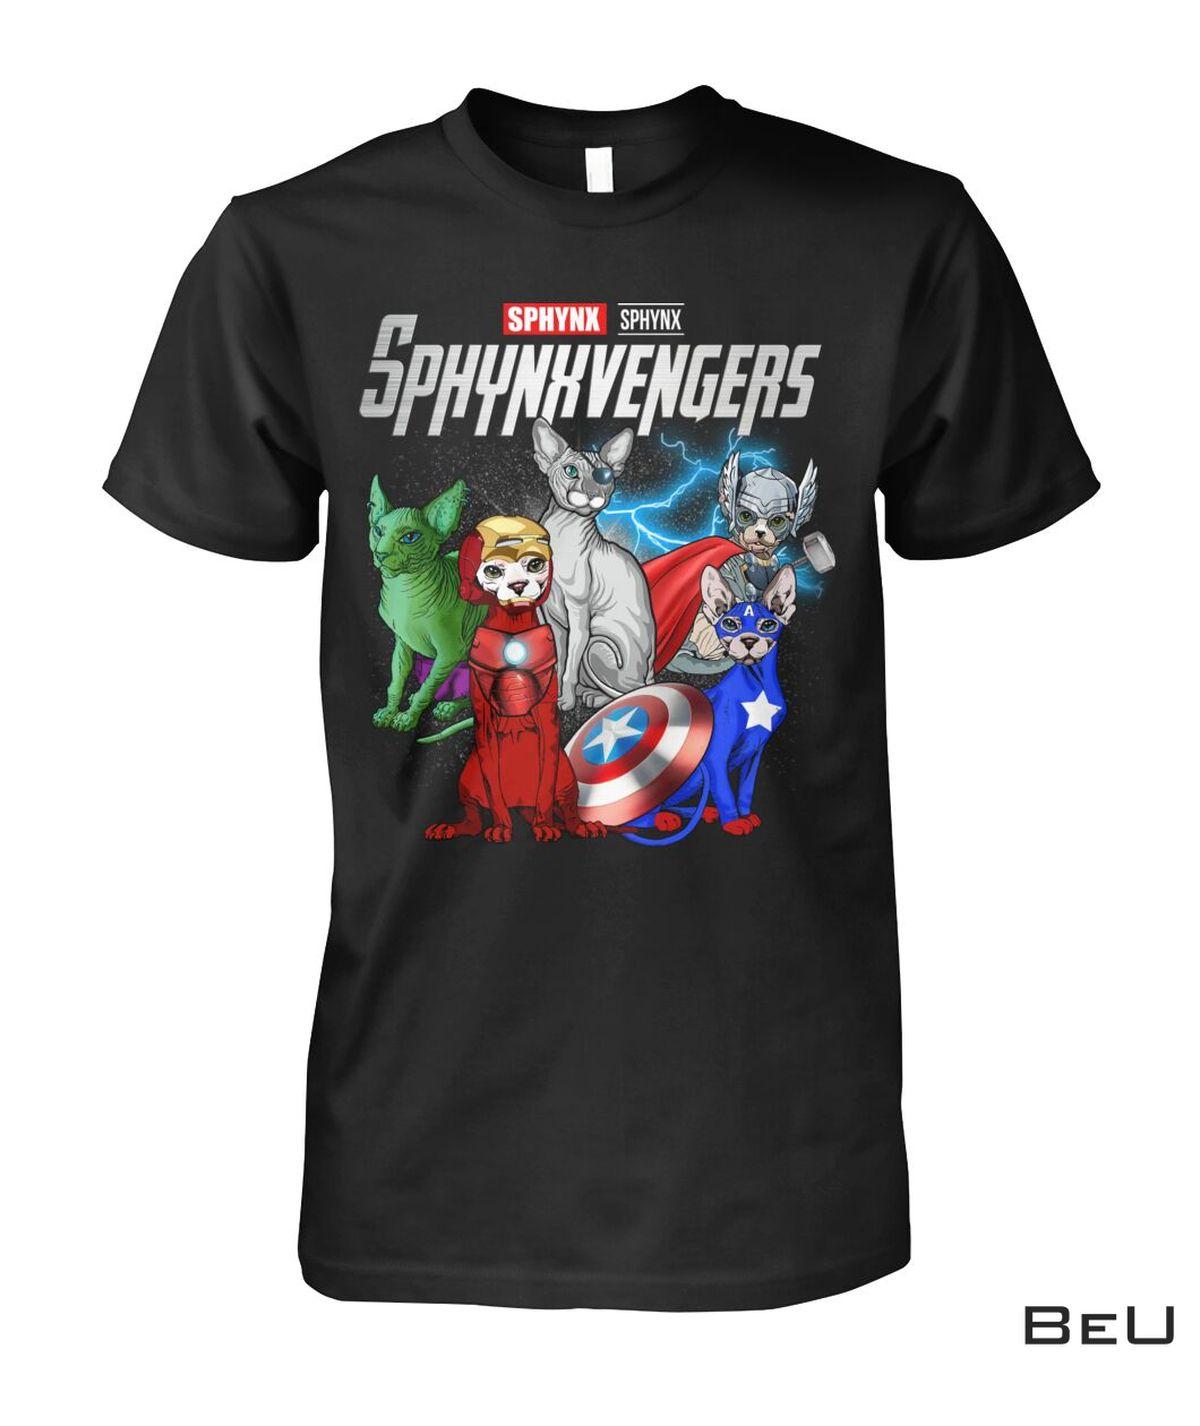 Sphynxvengers Sphynx Cat Avengers Shirt, hoodie, tank top